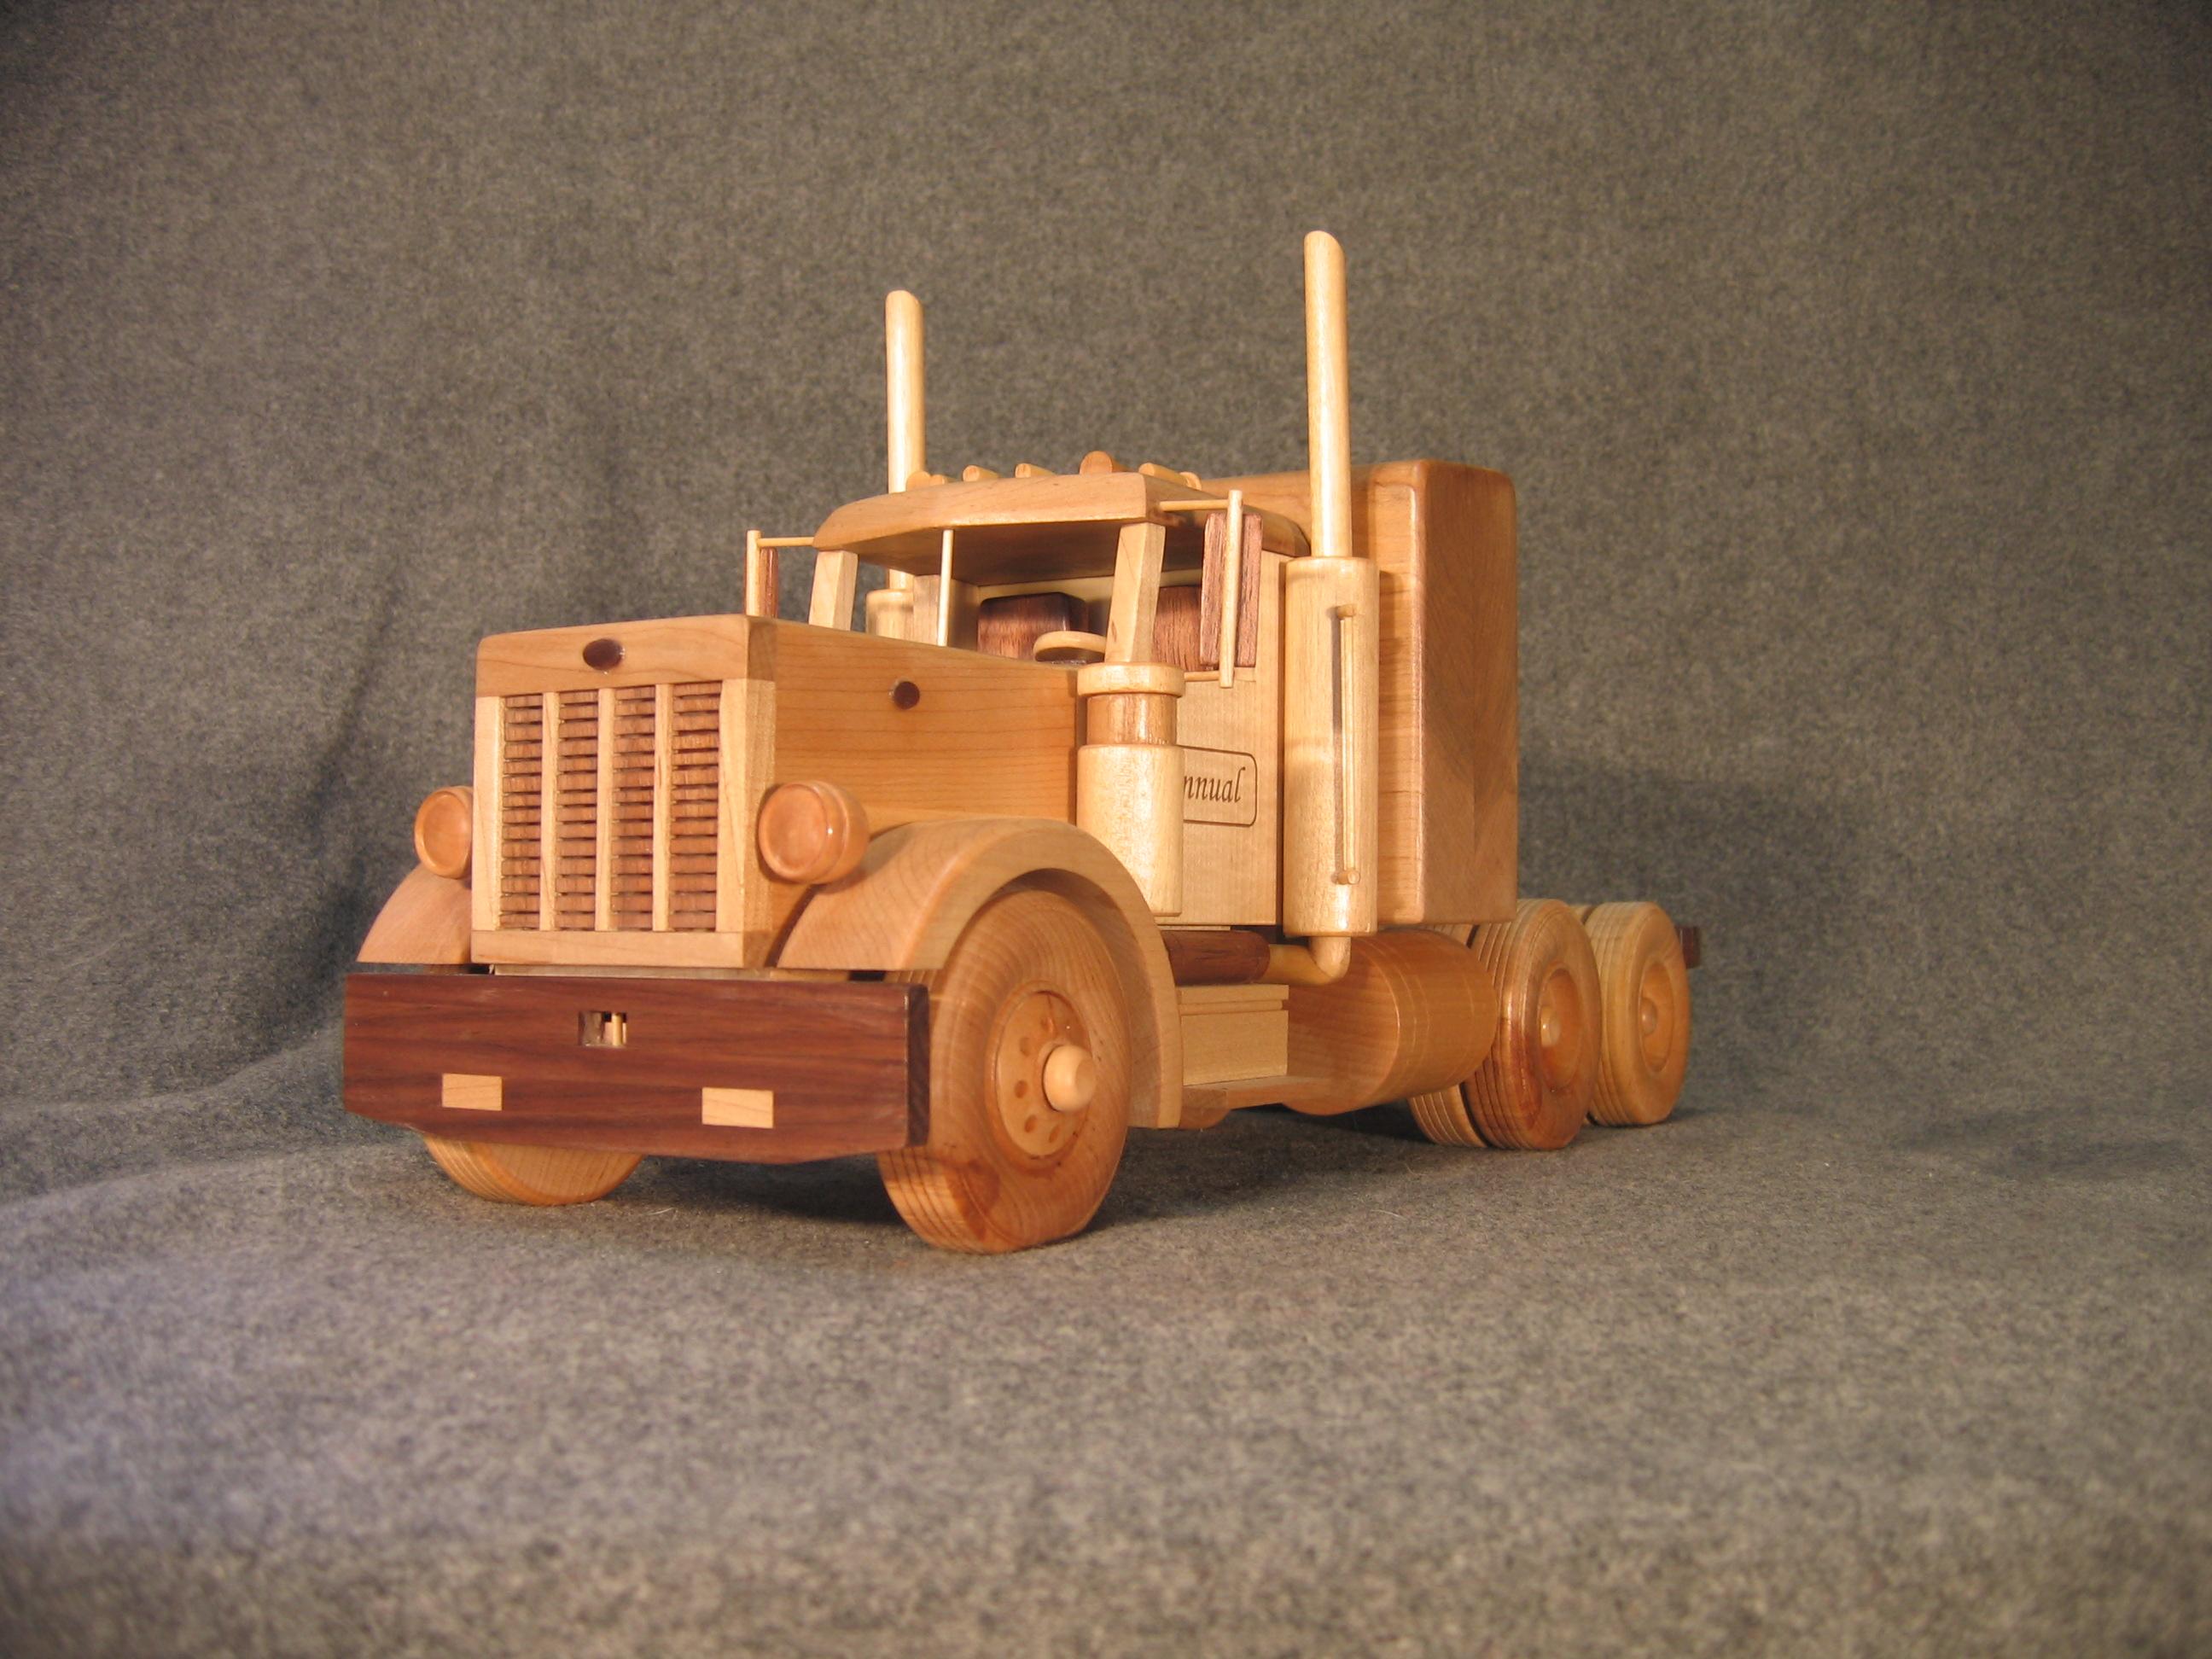 Knockabout Wooden Toys, Toy Trucks, wooden toy trucks, Wooden Toys ...